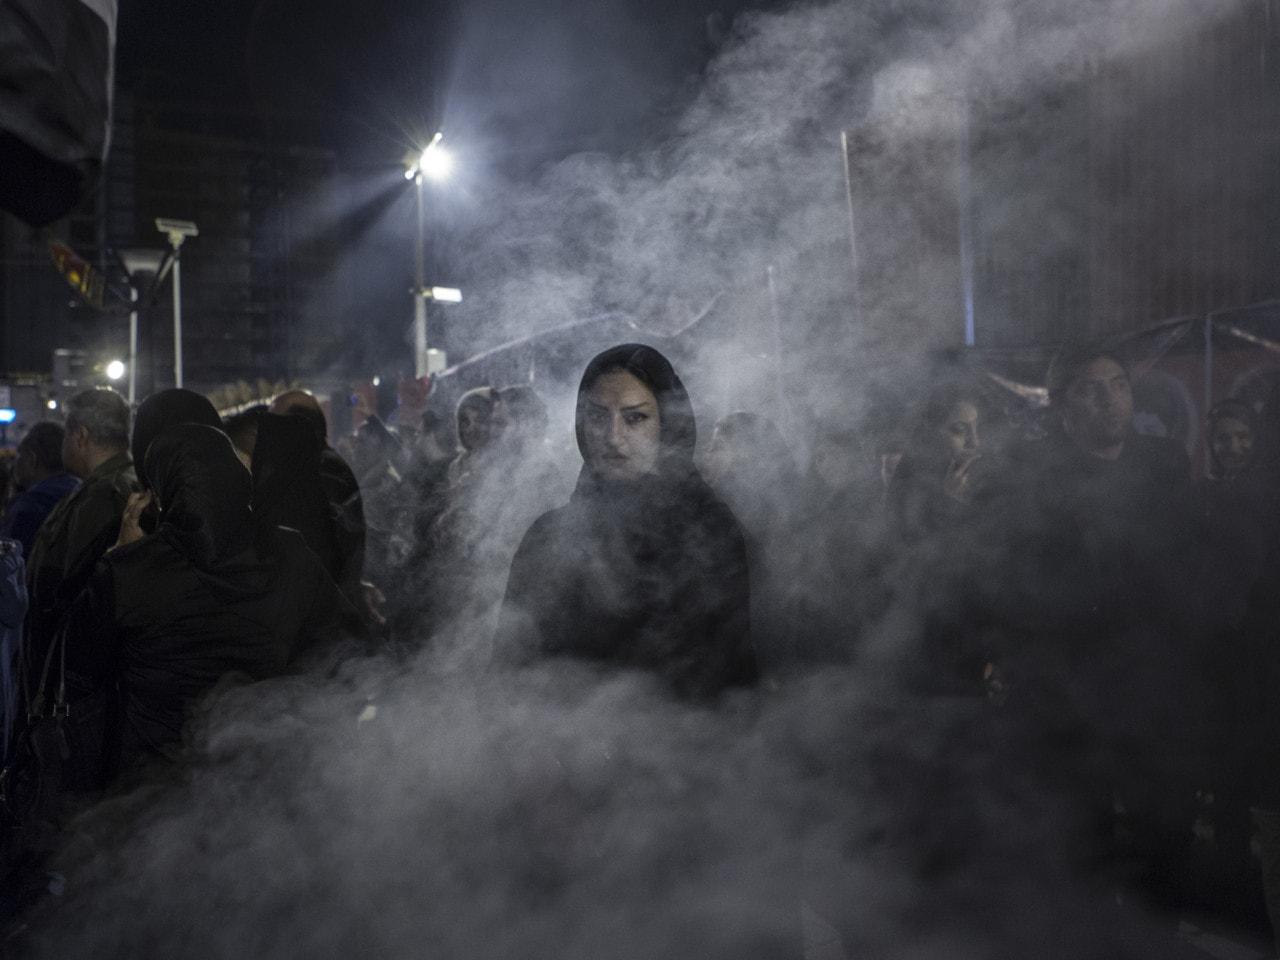 fotografía mujer musulmana entre humo Newsha Tavakolian